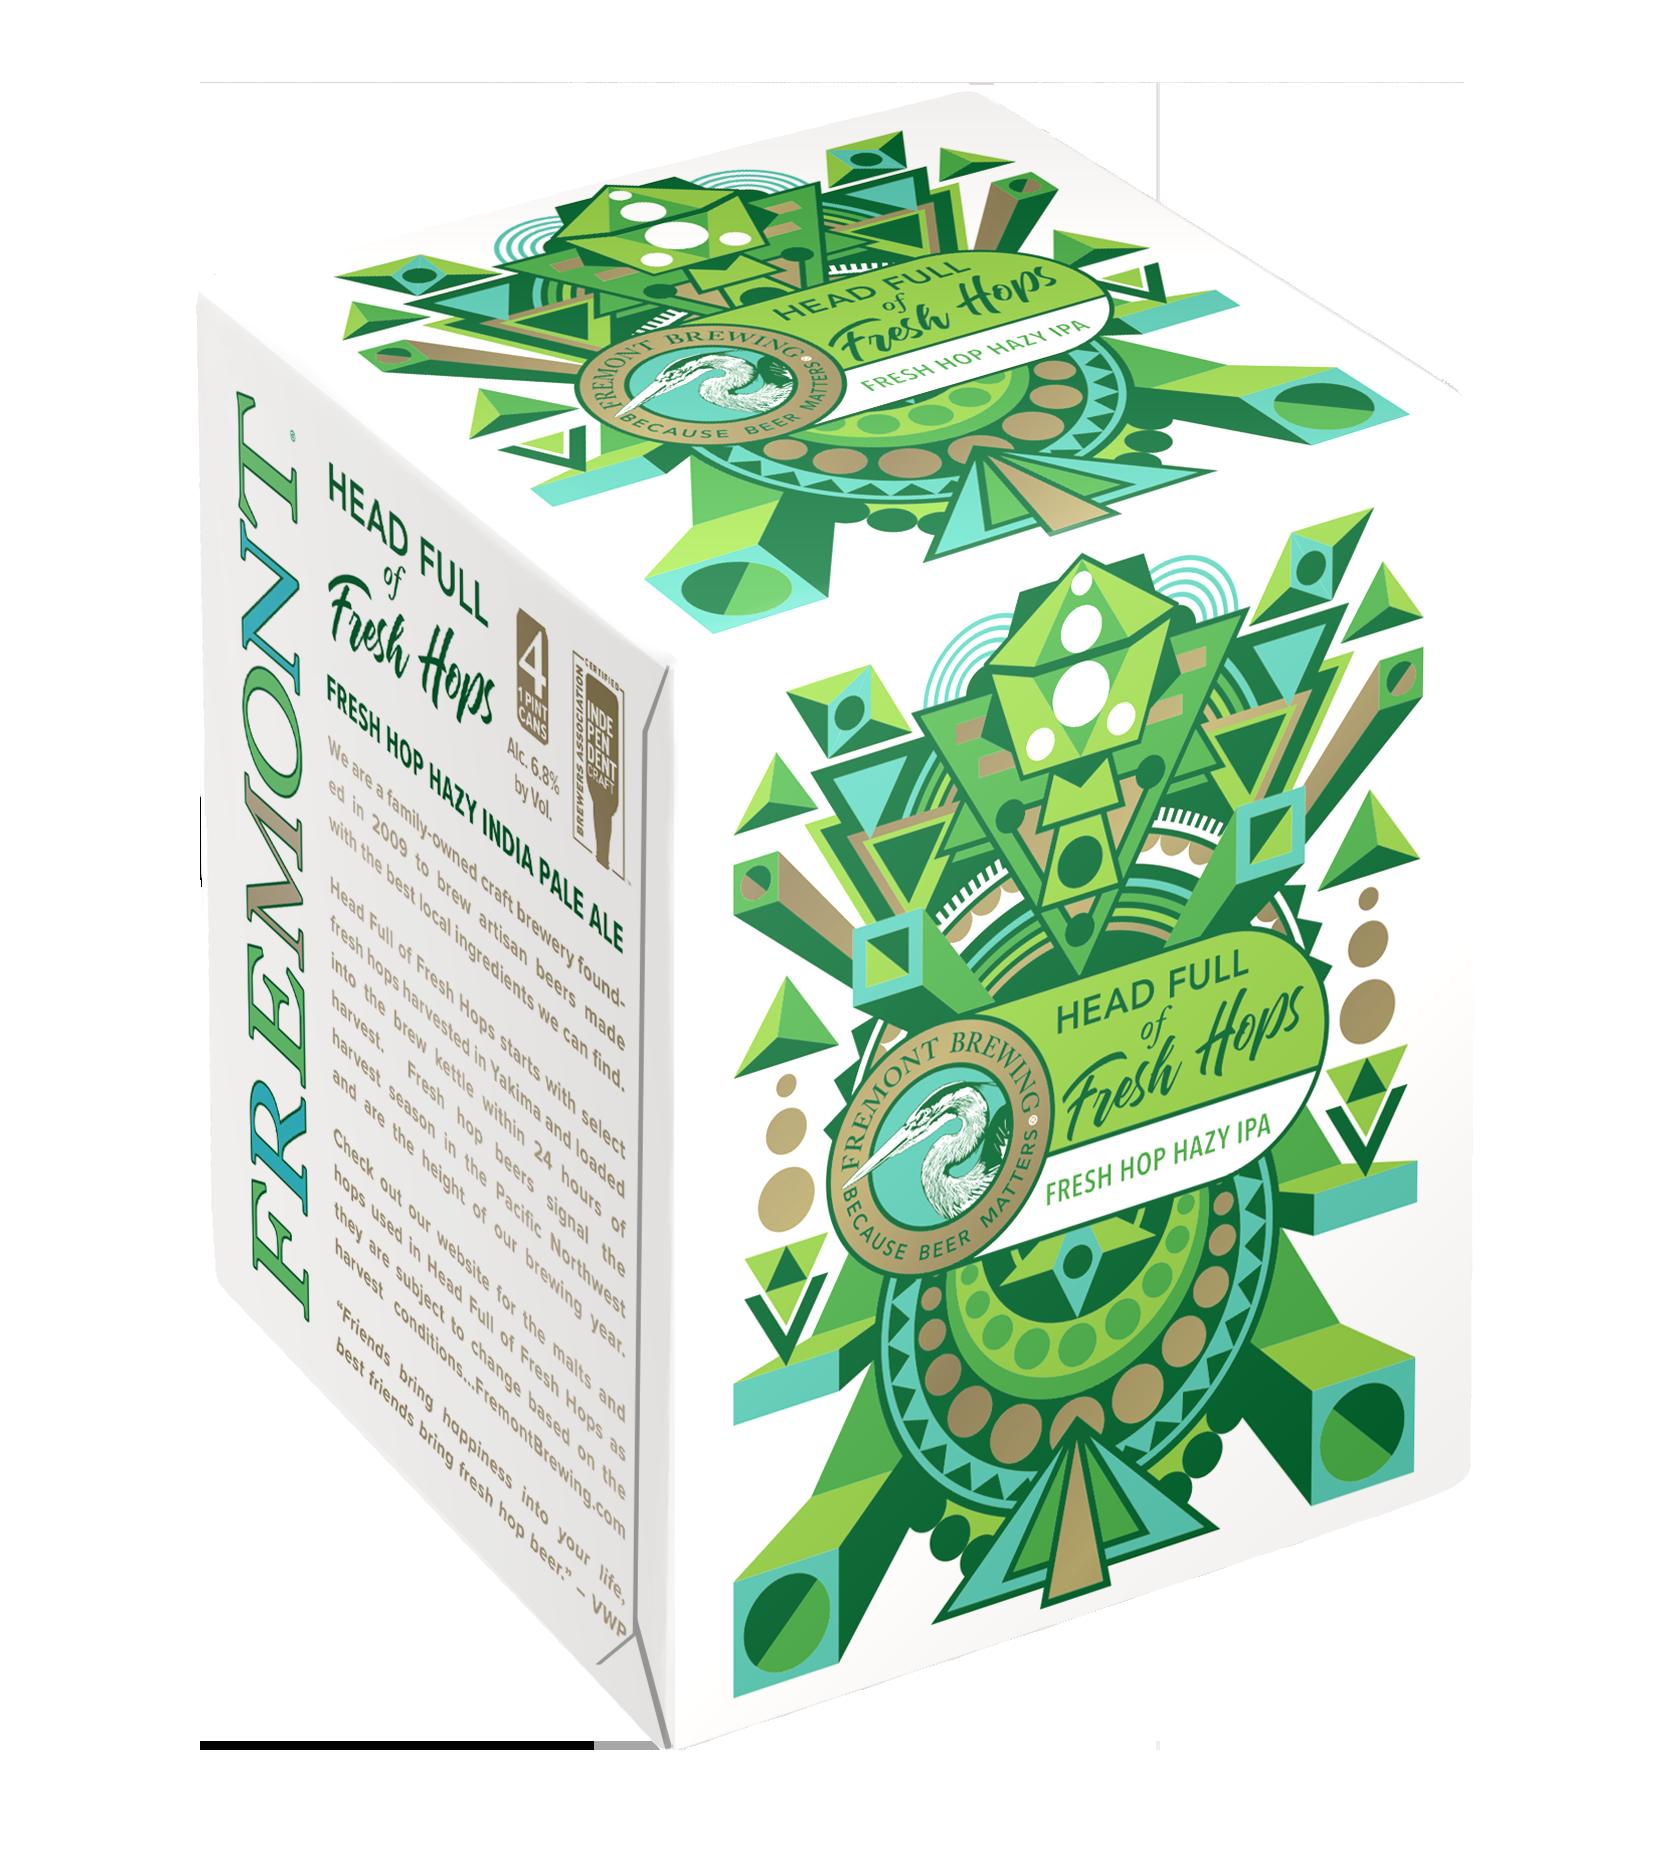 Head Full of Fresh Hops 4-Pack 16oz Cans